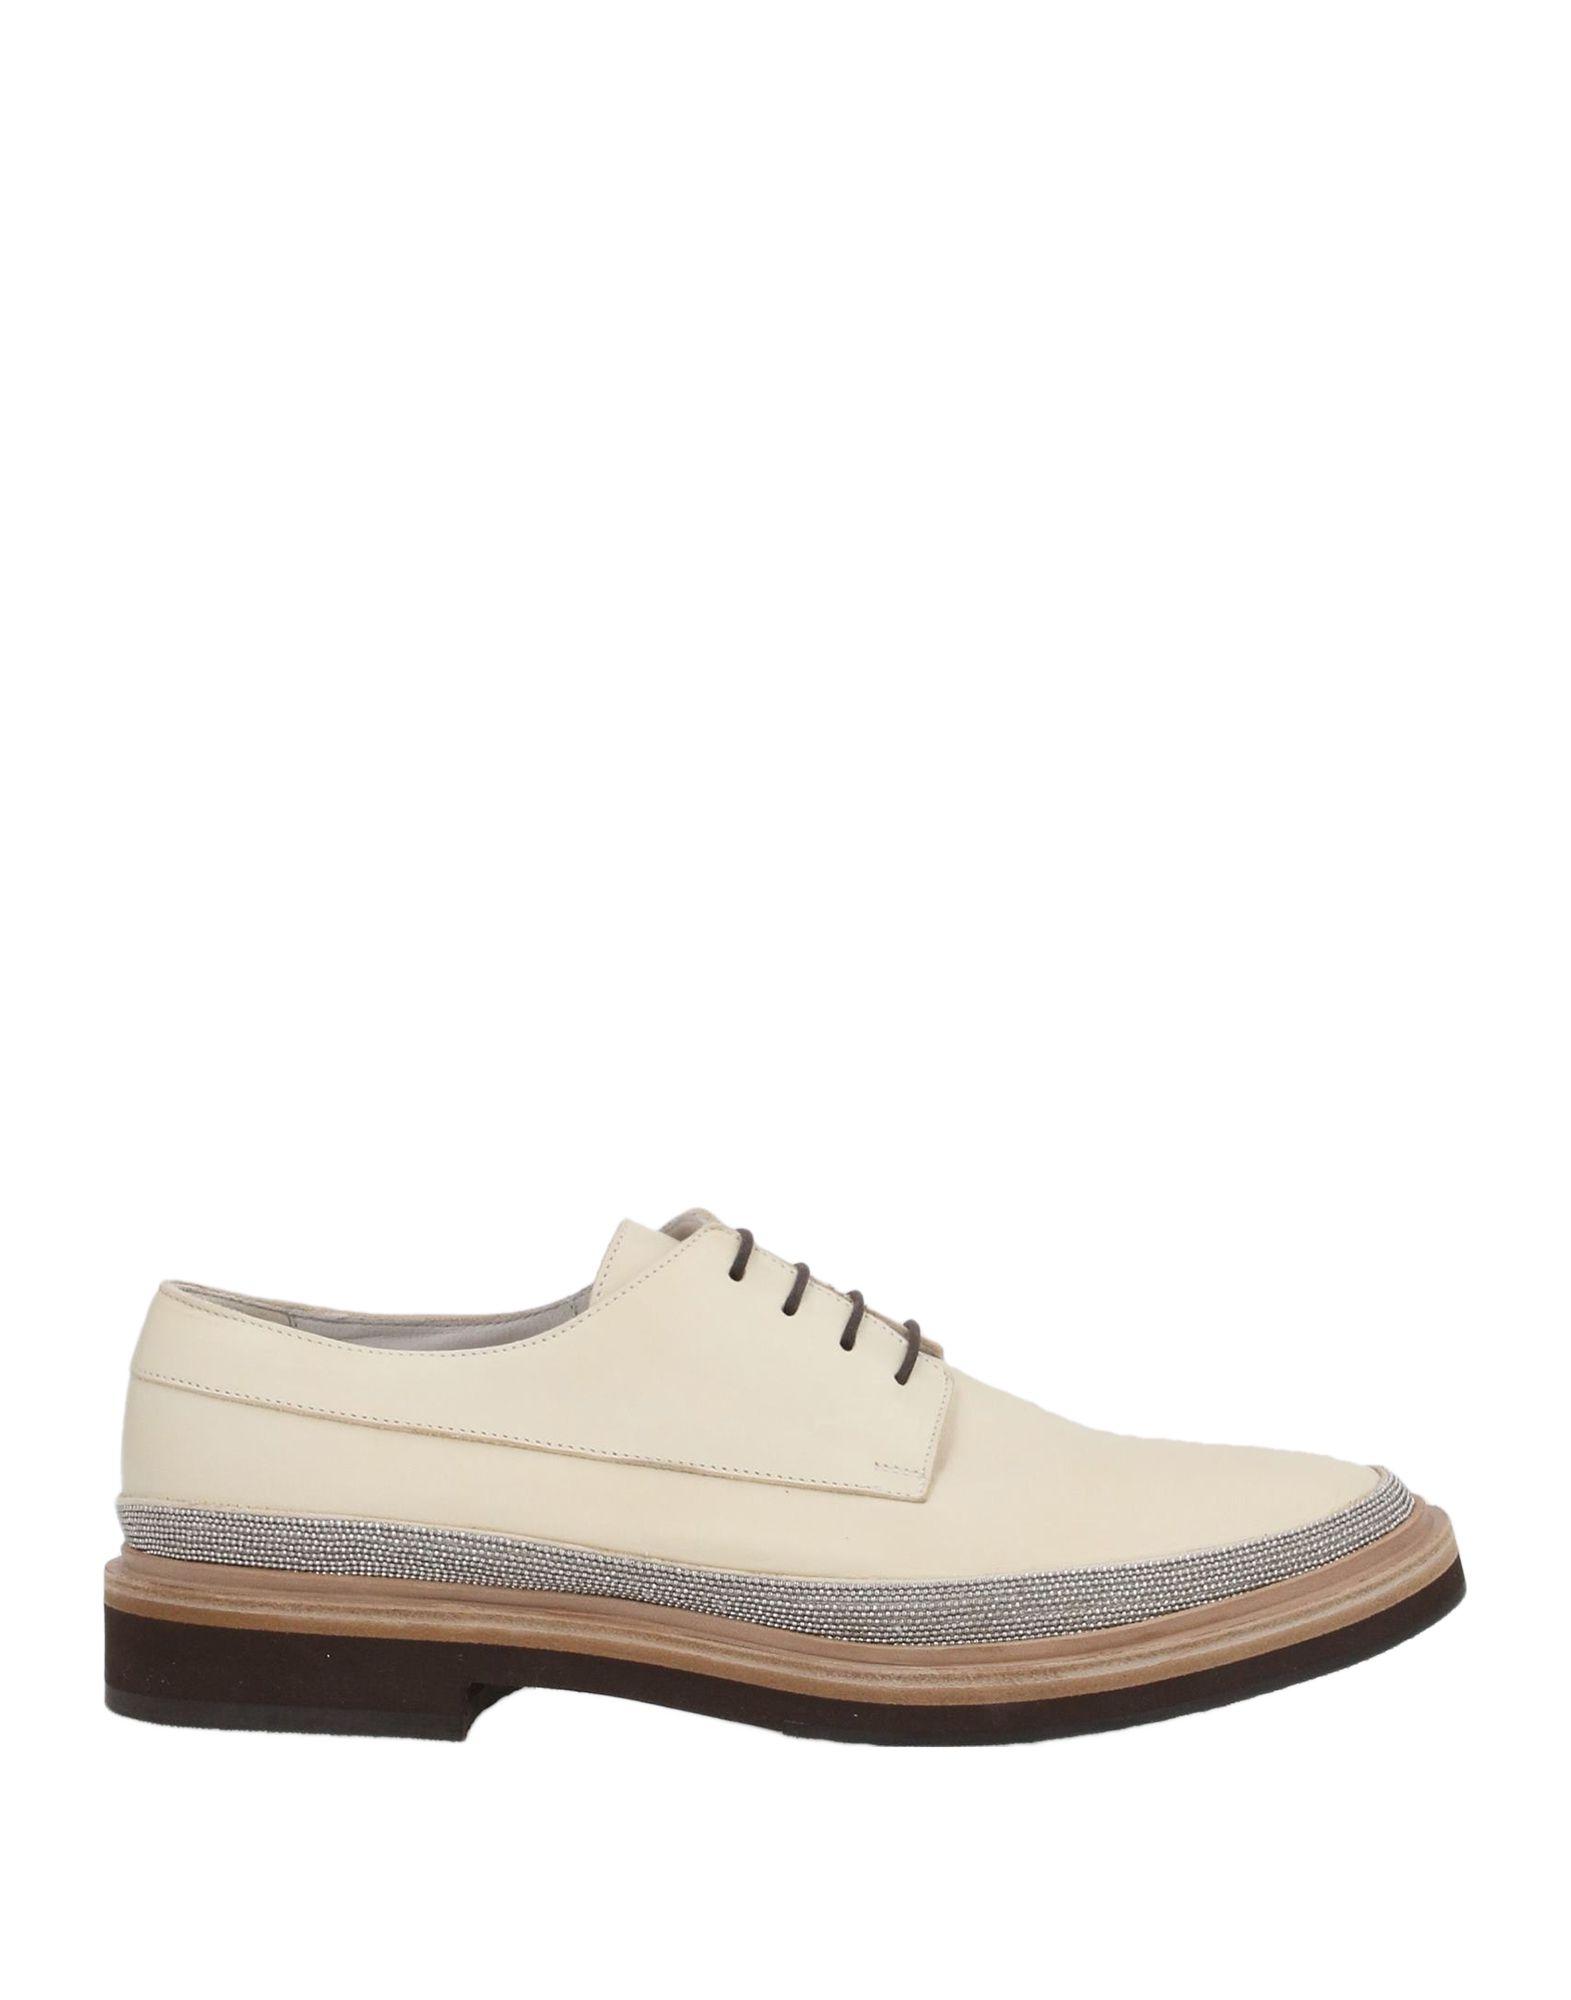 BRUNELLO CUCINELLI Обувь на шнурках brunello cucinelli обувь на шнурках